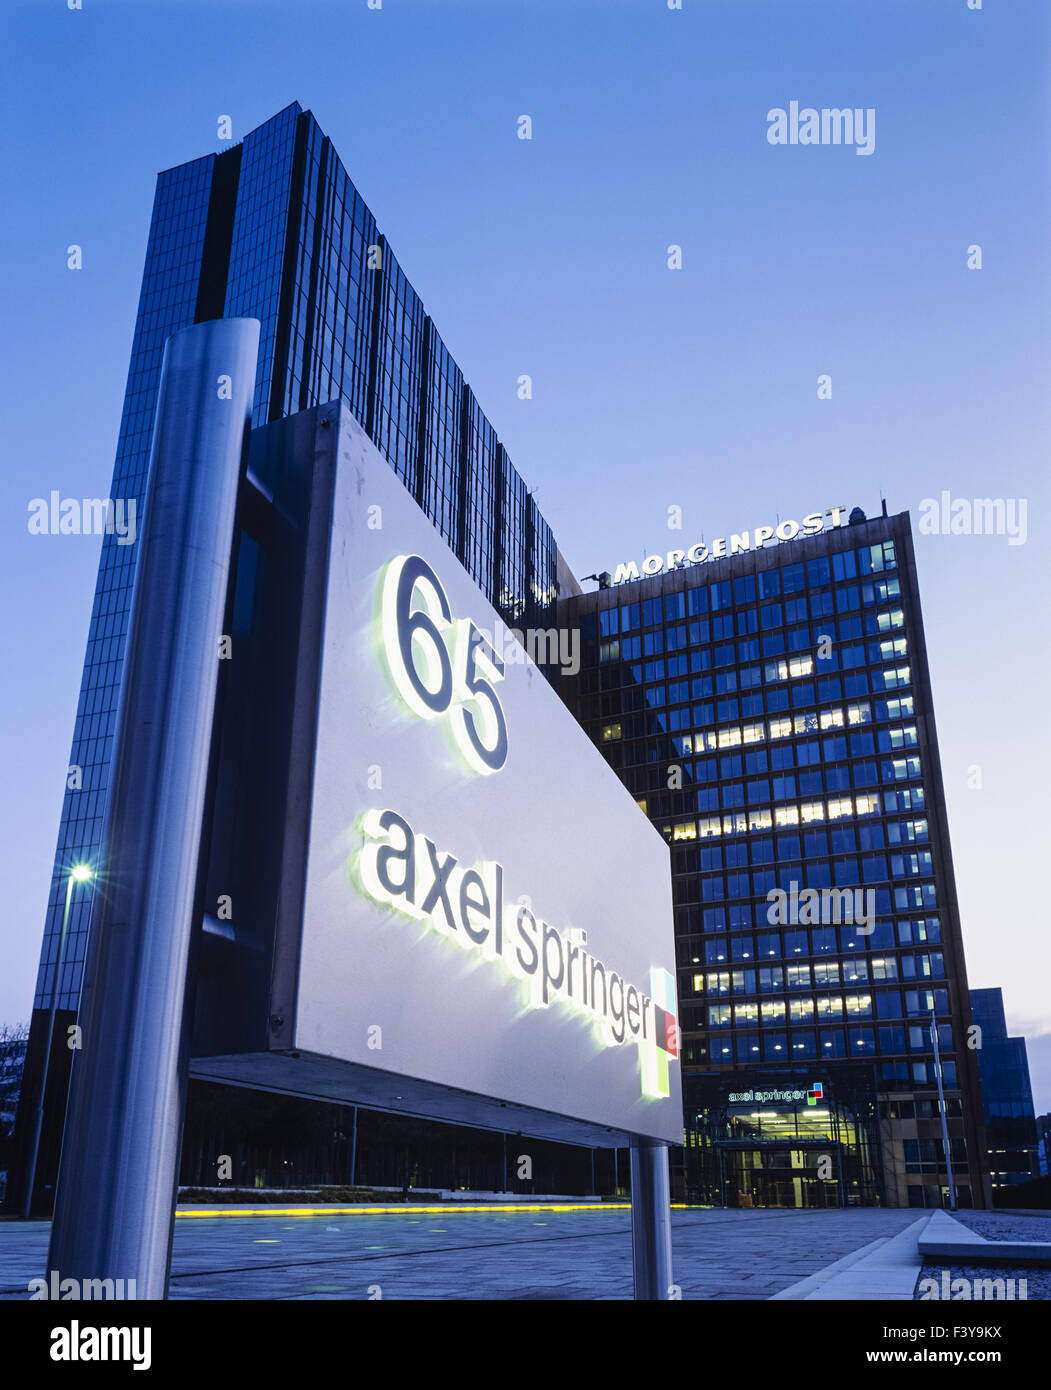 Axel Springer corporate headquarters, Berlin - Stock Image